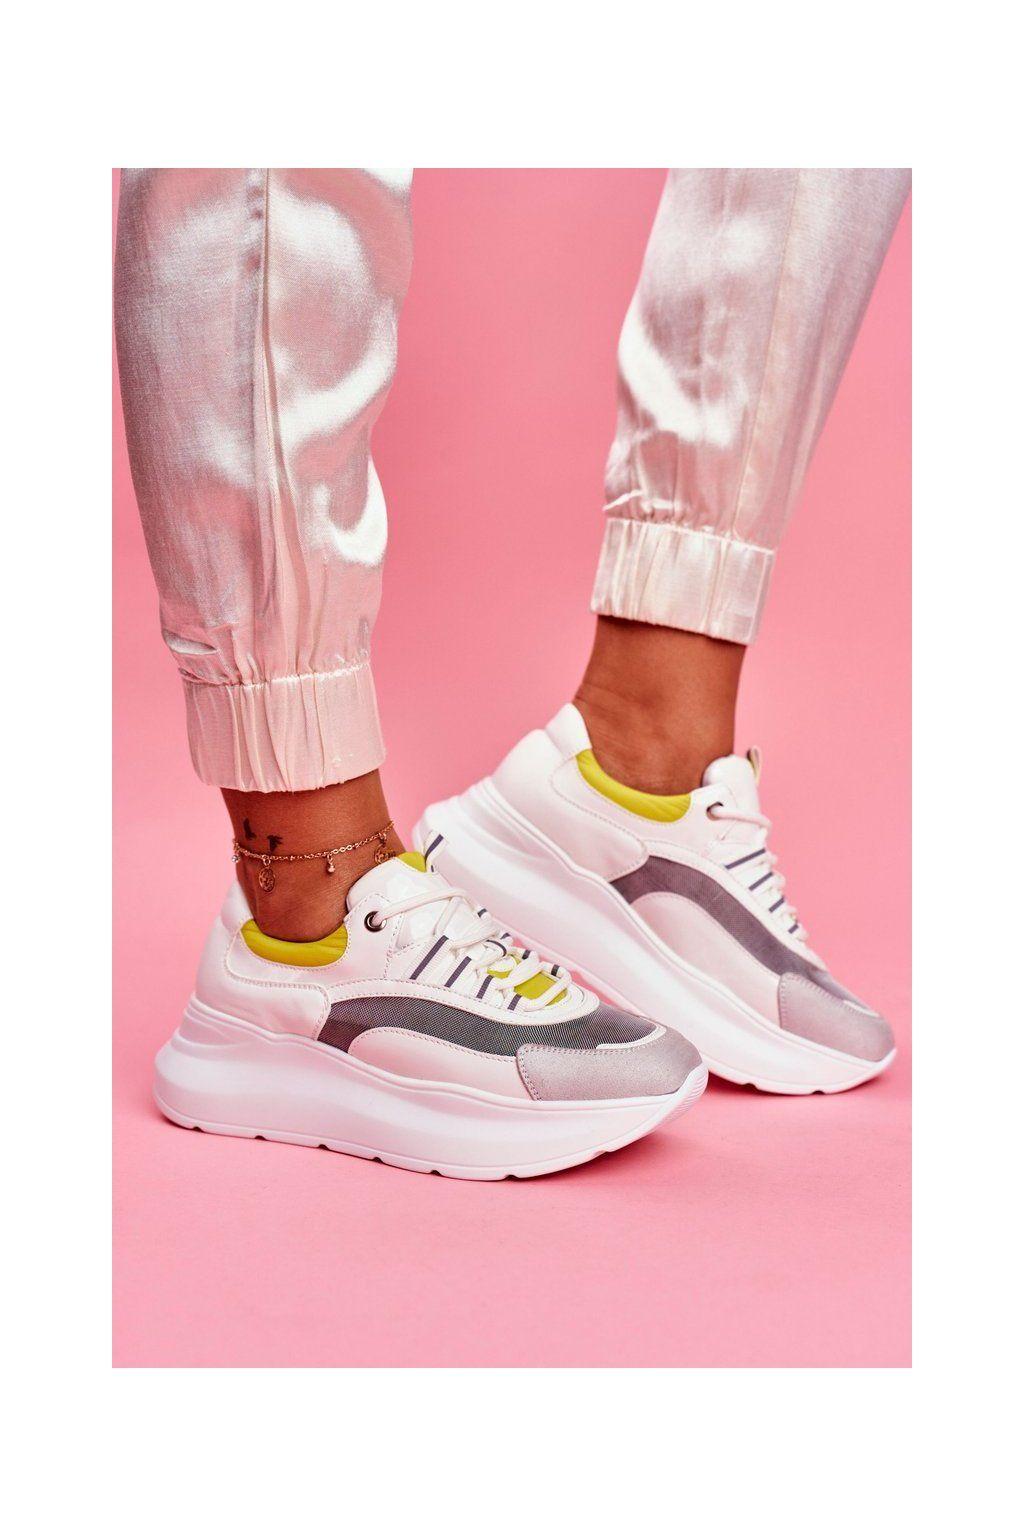 Damske Tenisky Farba Zlta Kod Obuvi Kp2350 An Anis Naj Sk Sneakers Nike Air Max Sneakers Sneakers